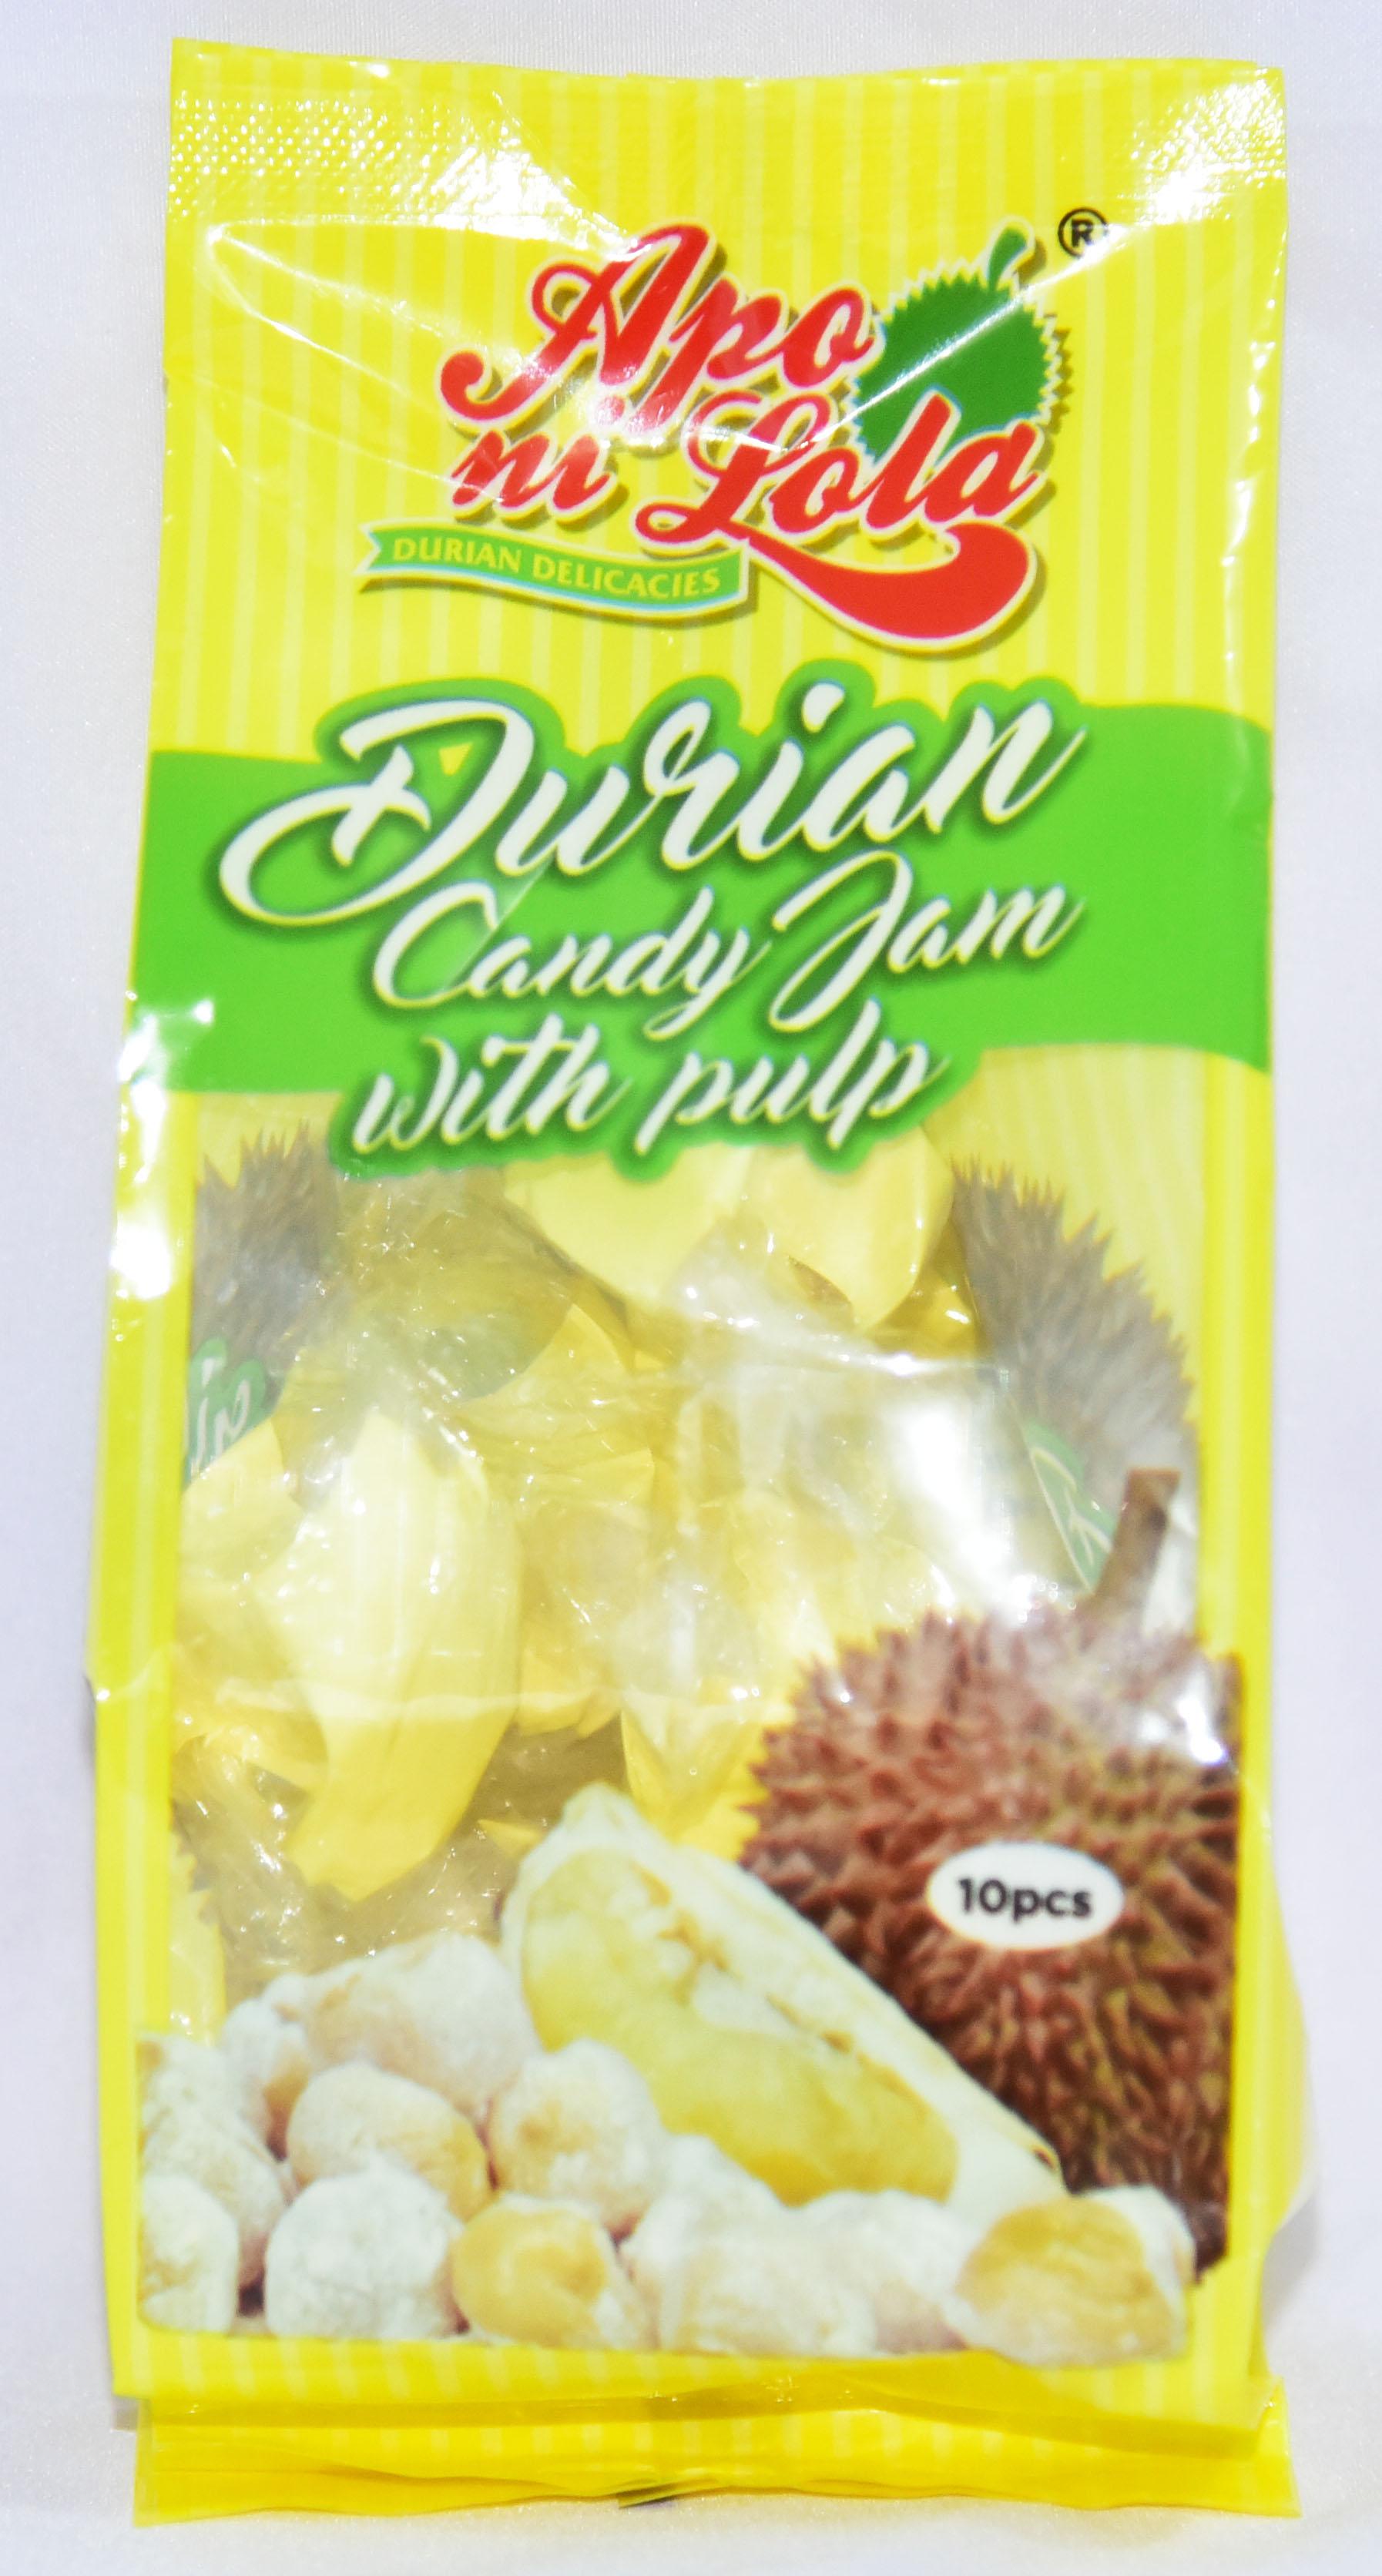 Durian Candy Jam